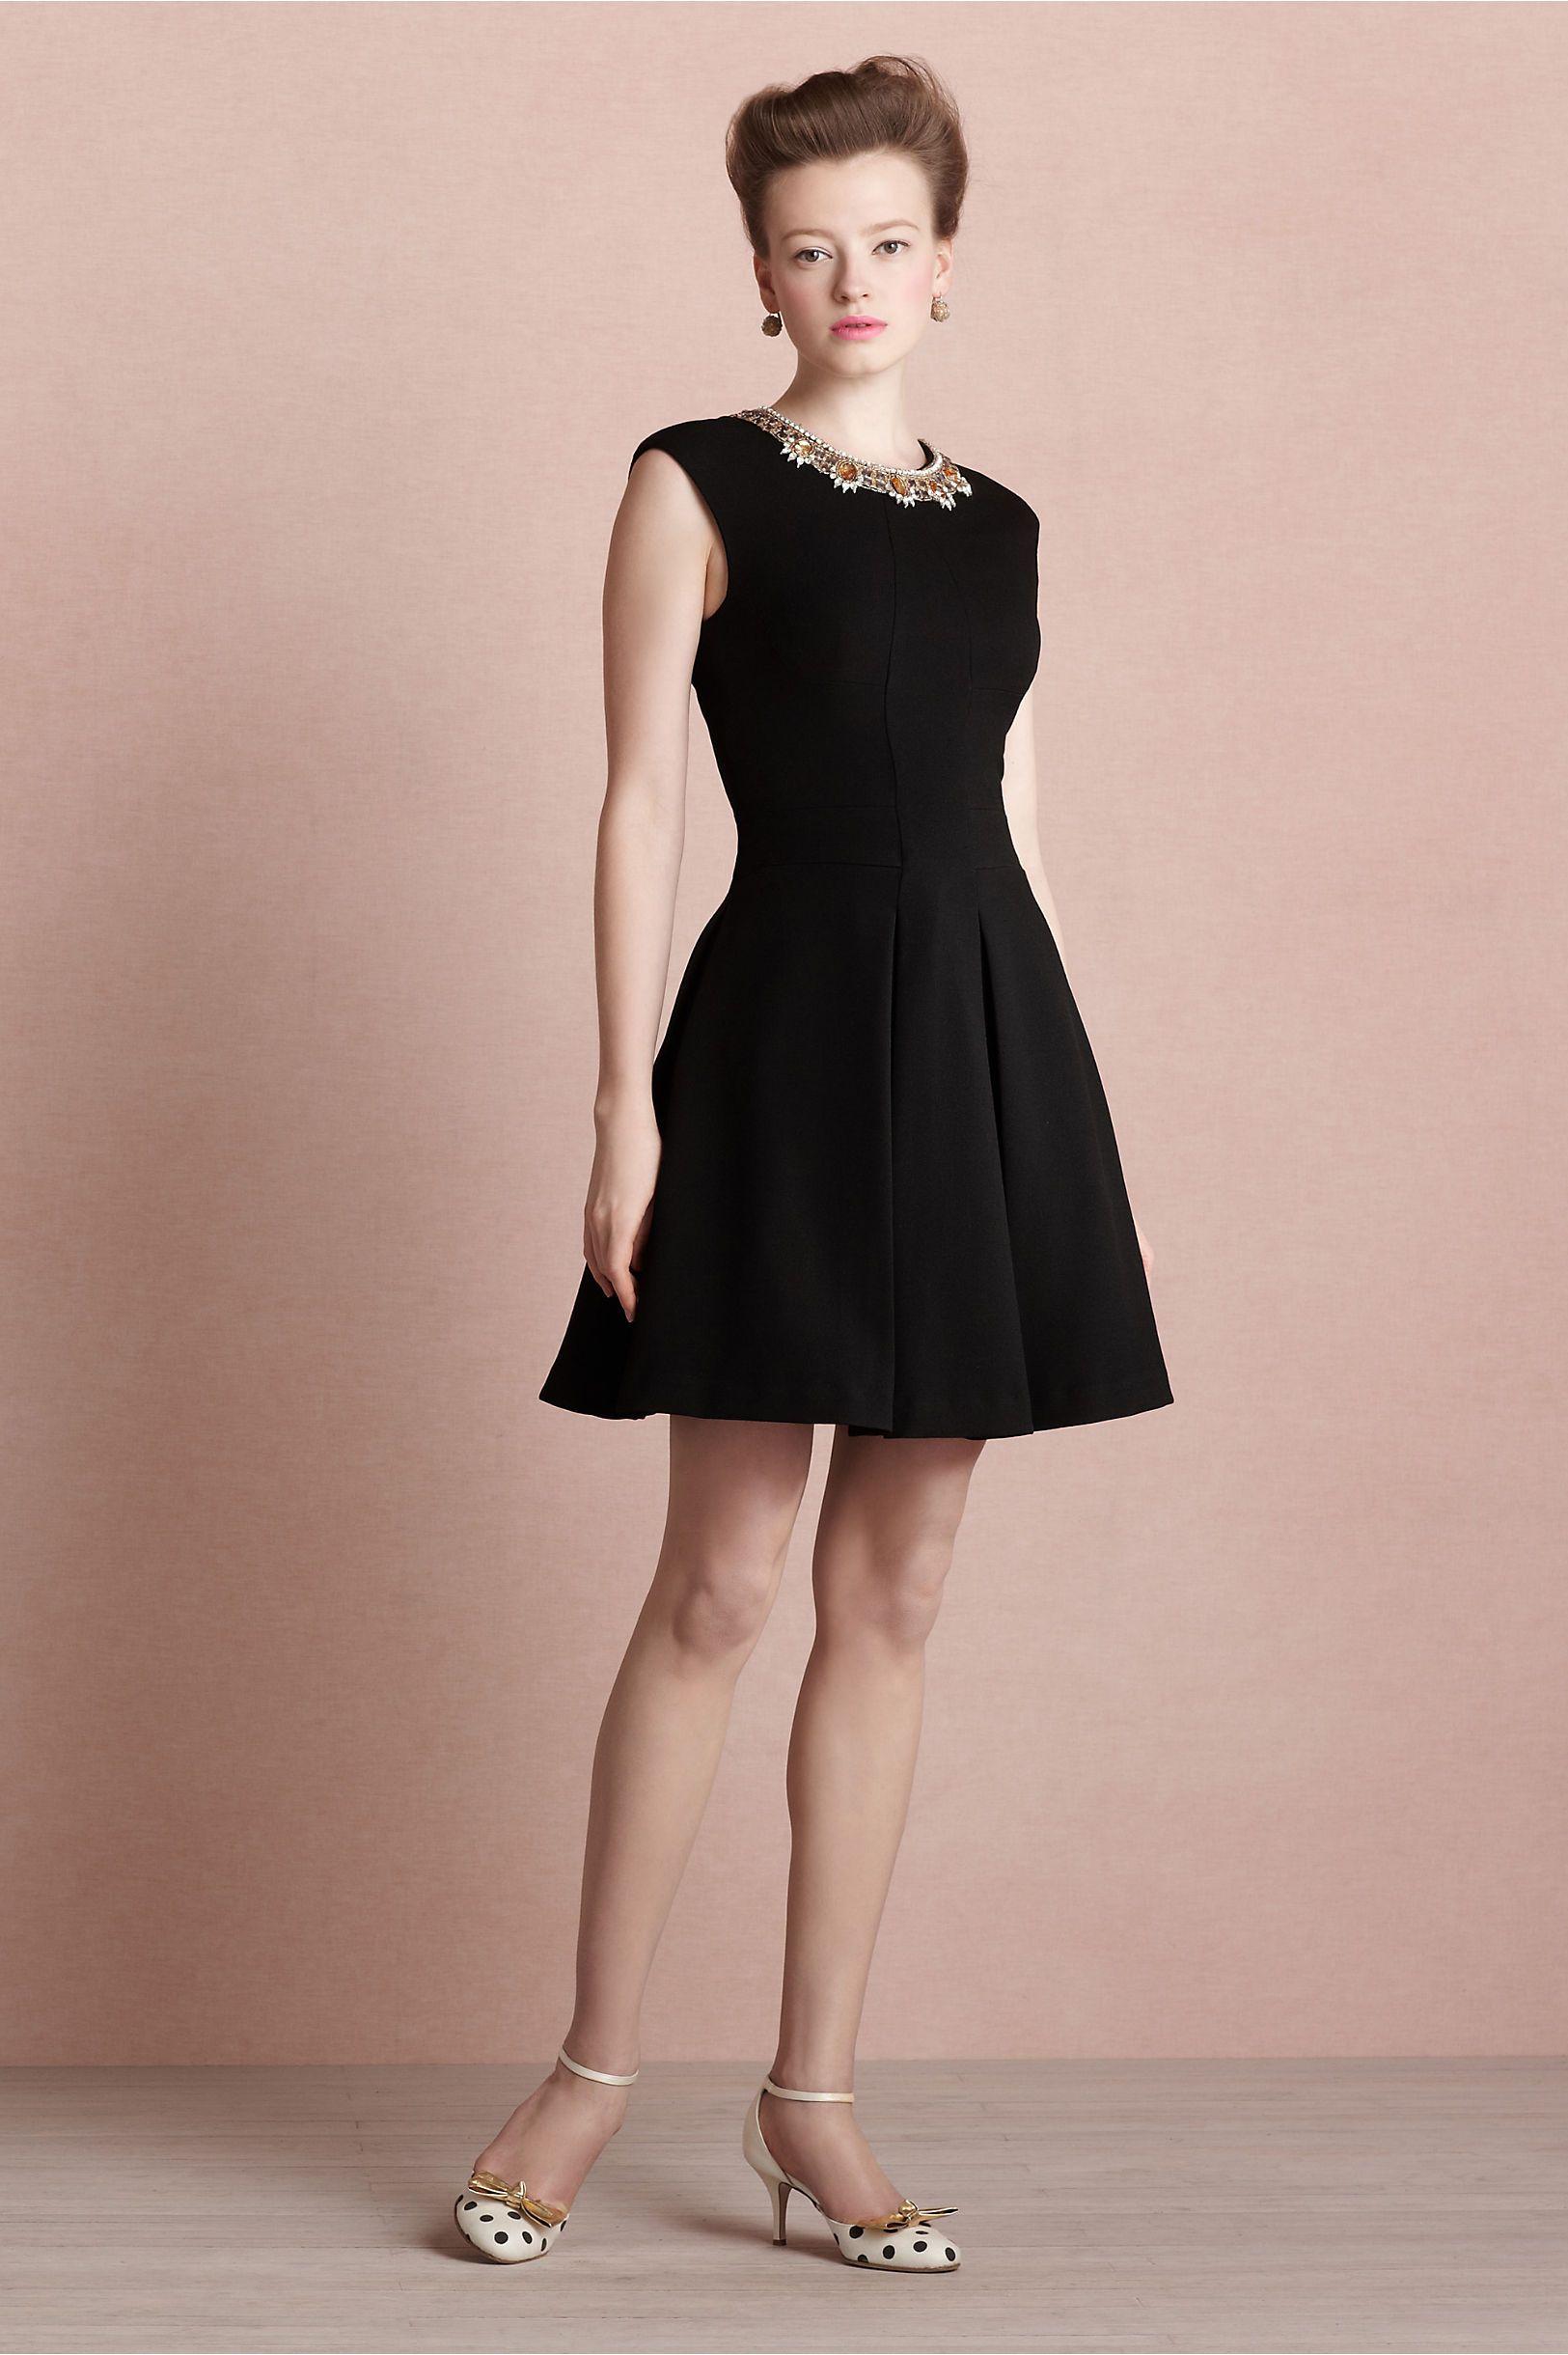 Bijoux Dress | silhouette inspiration | Pinterest | Vestiditos